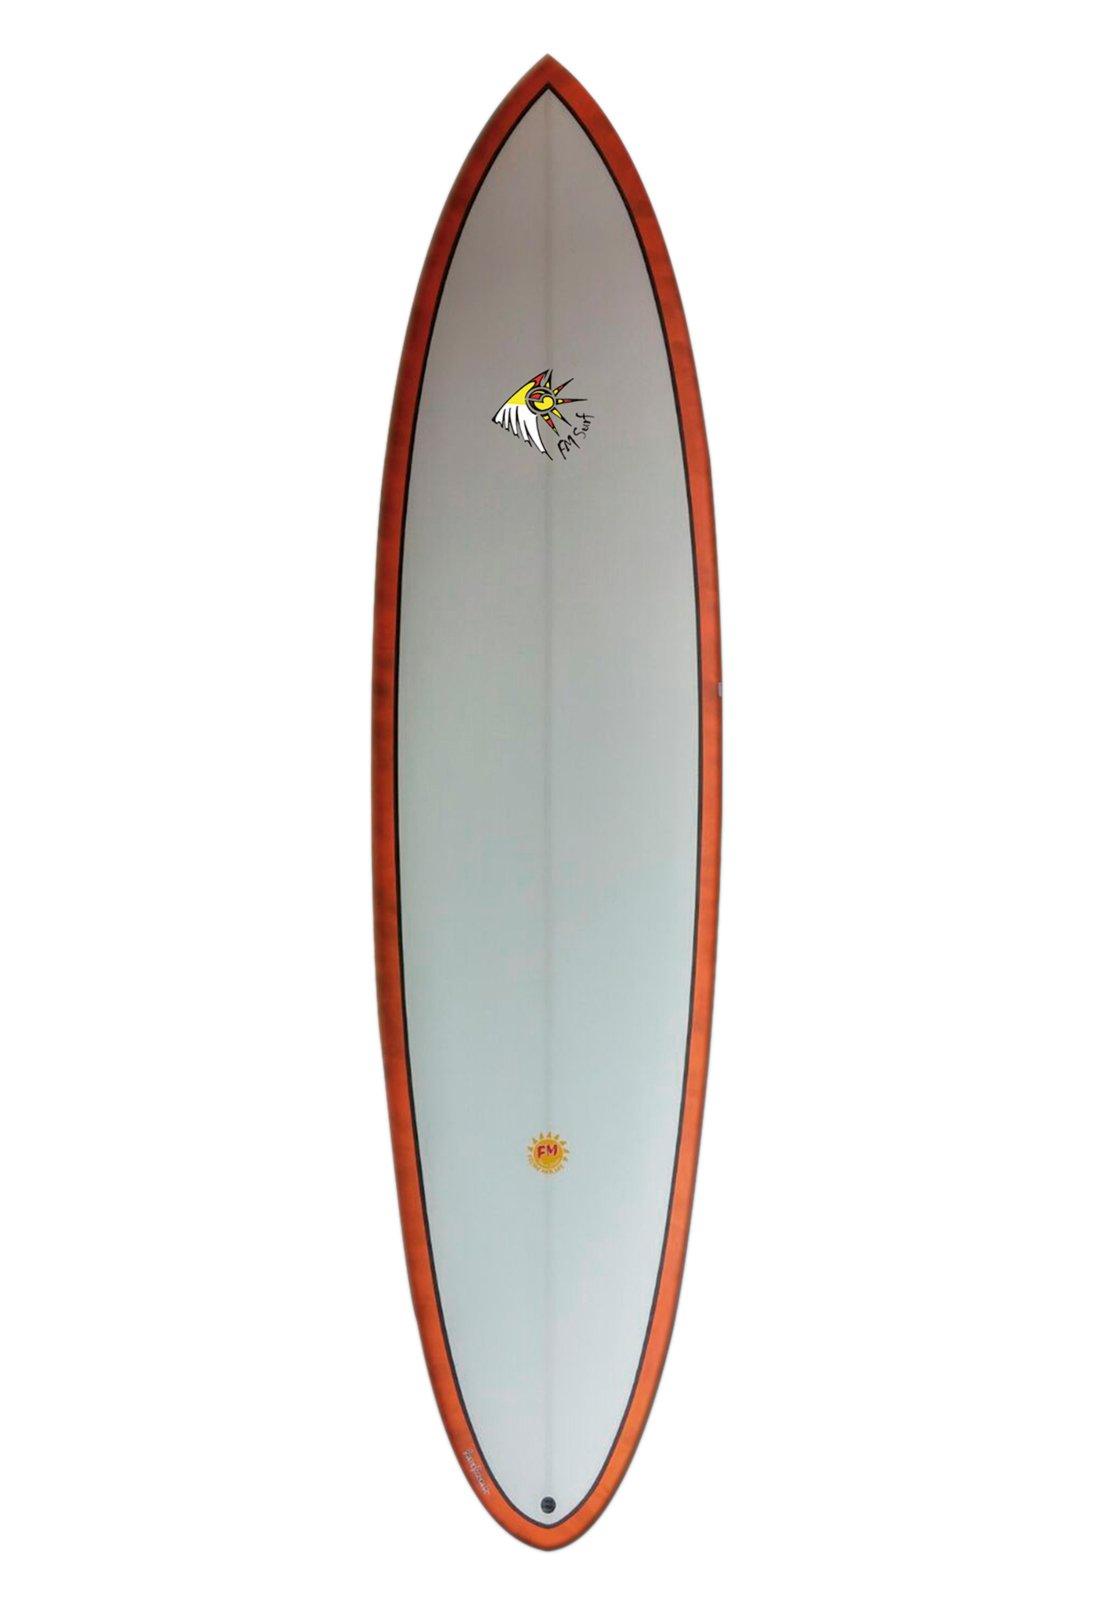 Circuito Mundial De Surf : Circuito mundial de surf